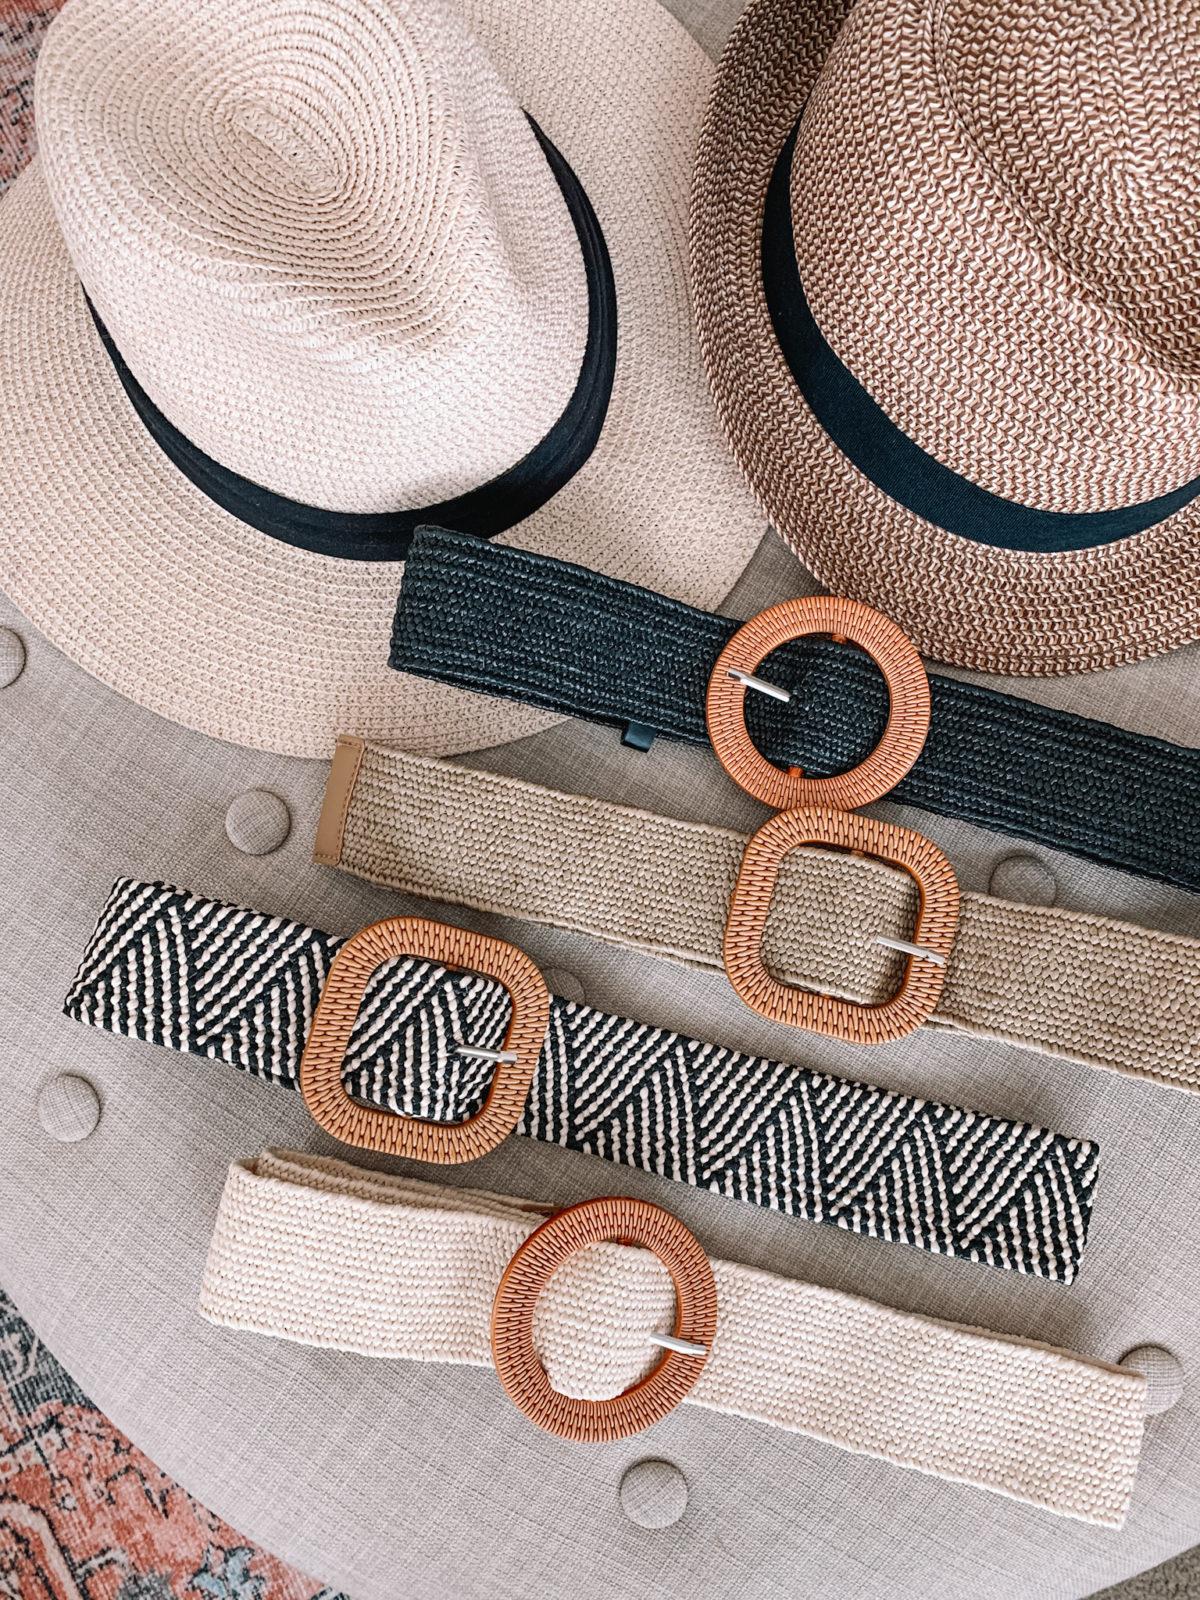 Amazon woven belts